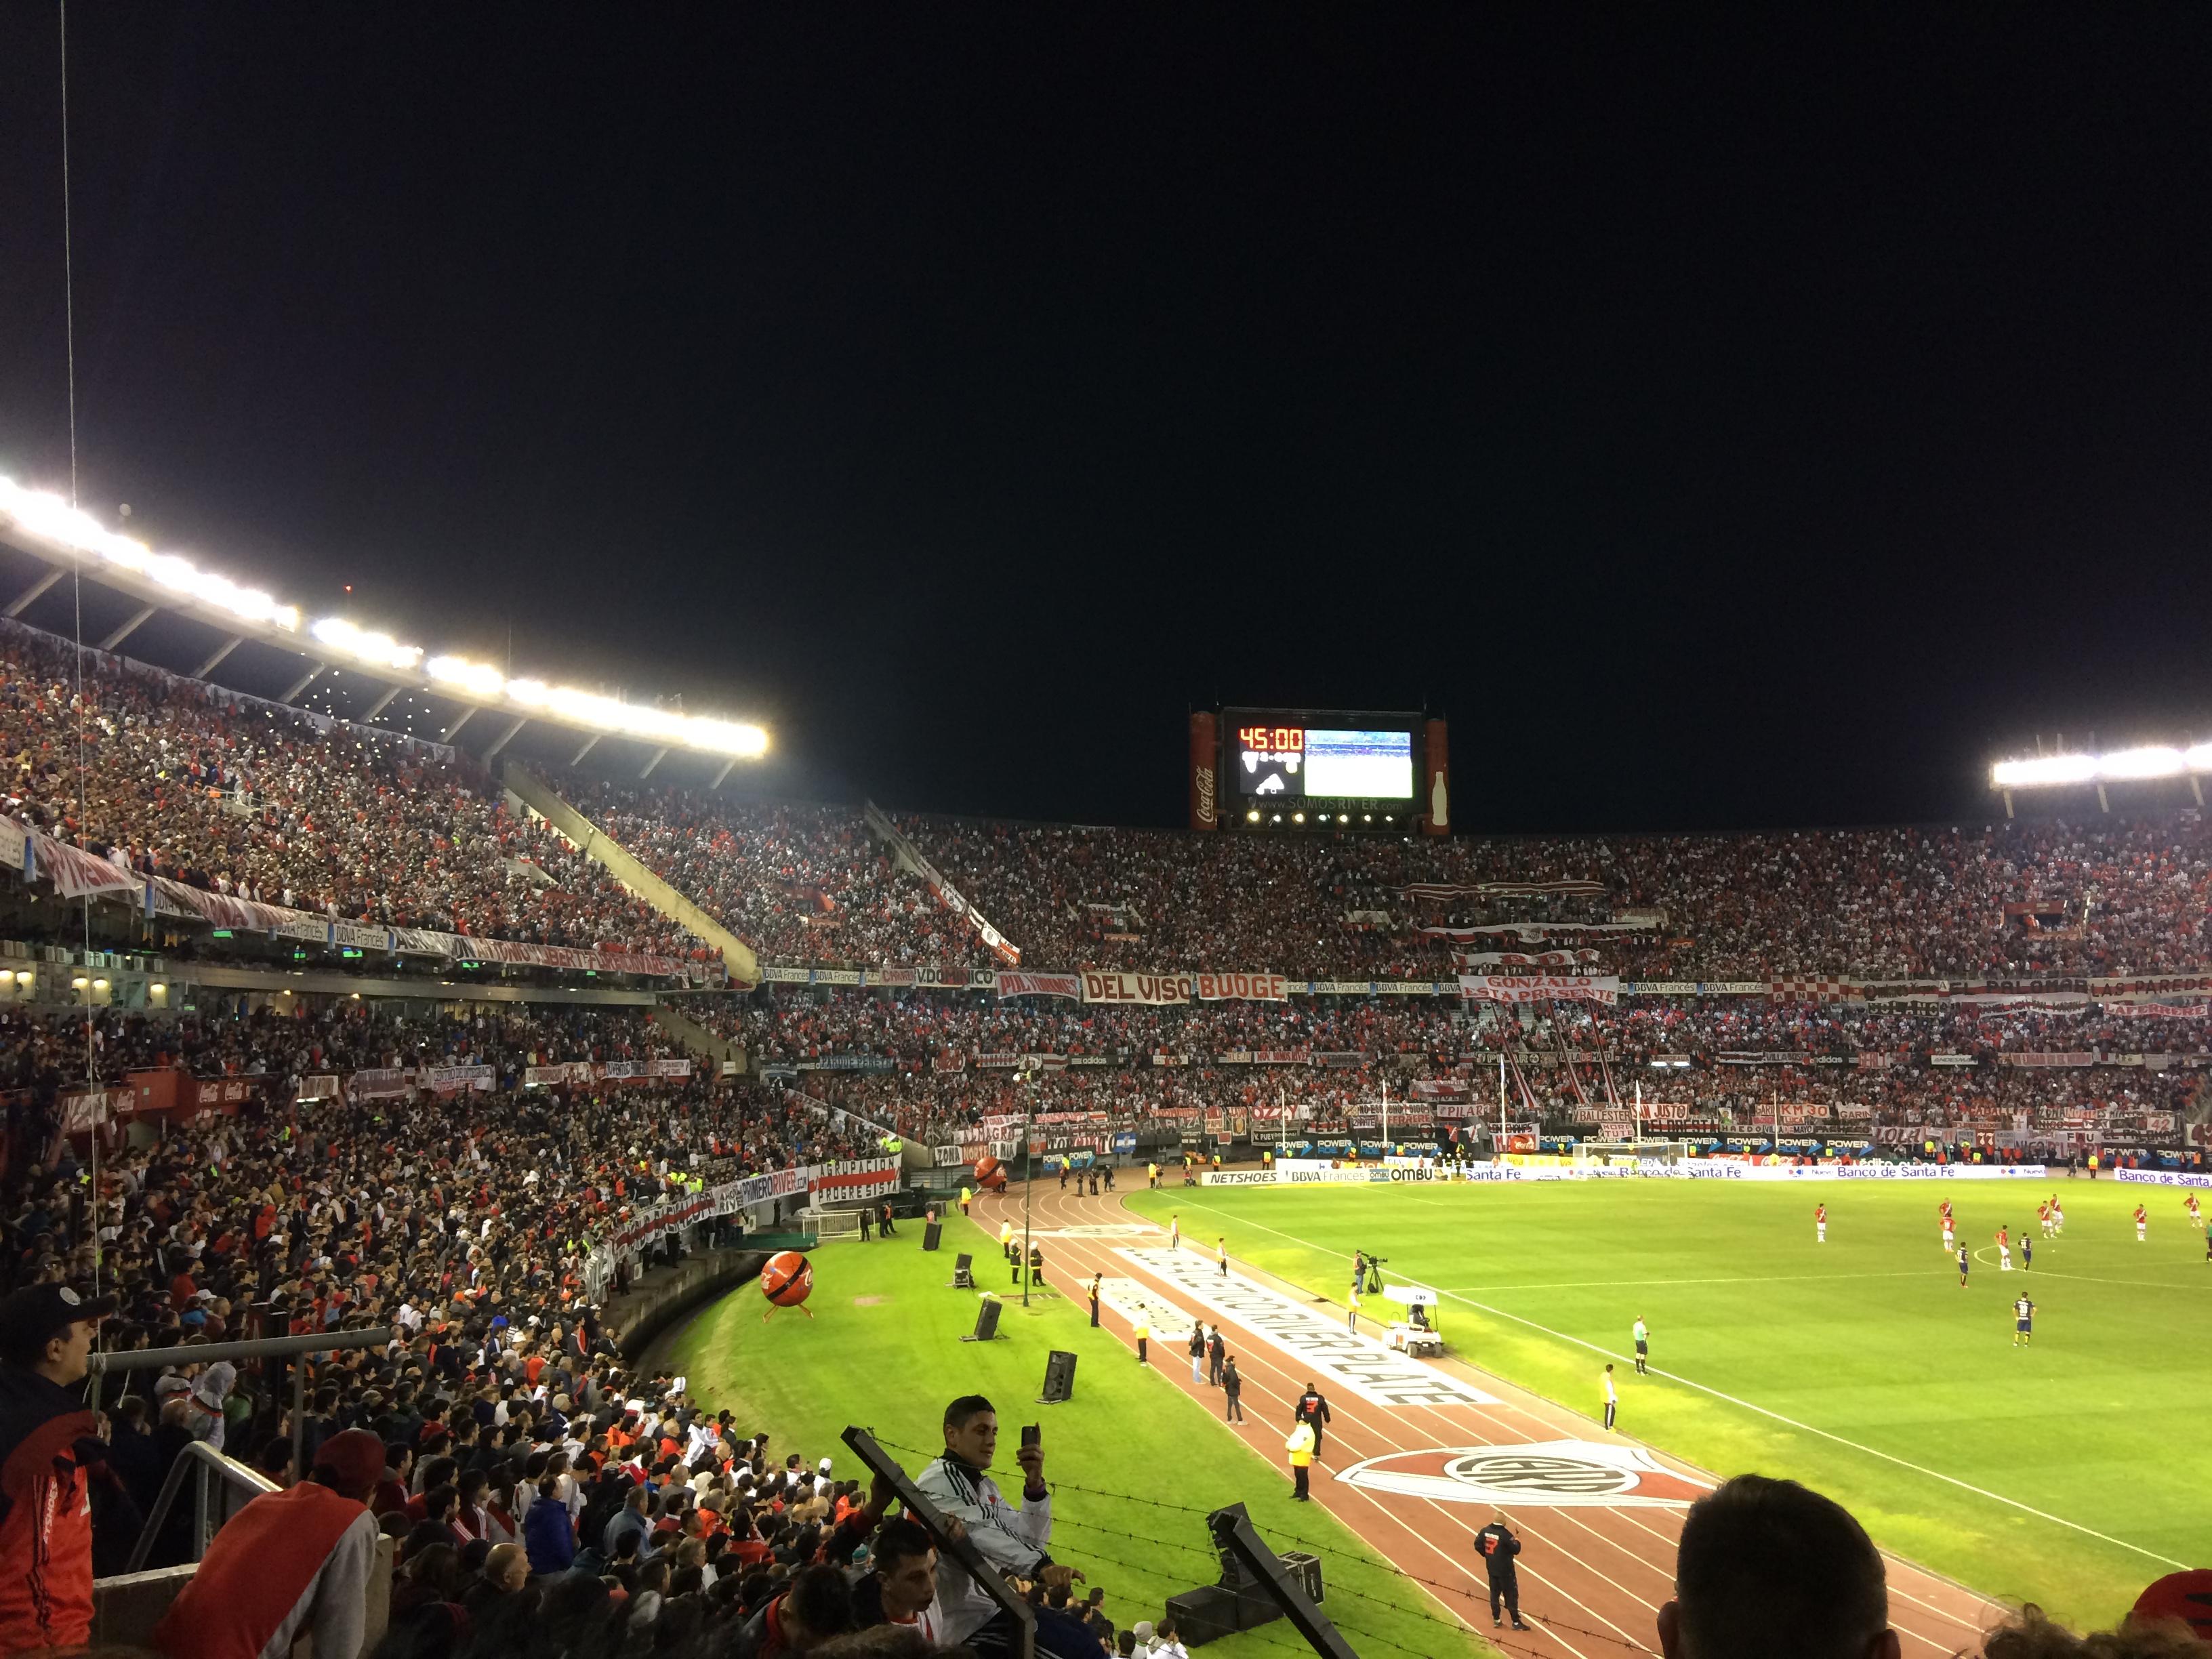 BA futbol match